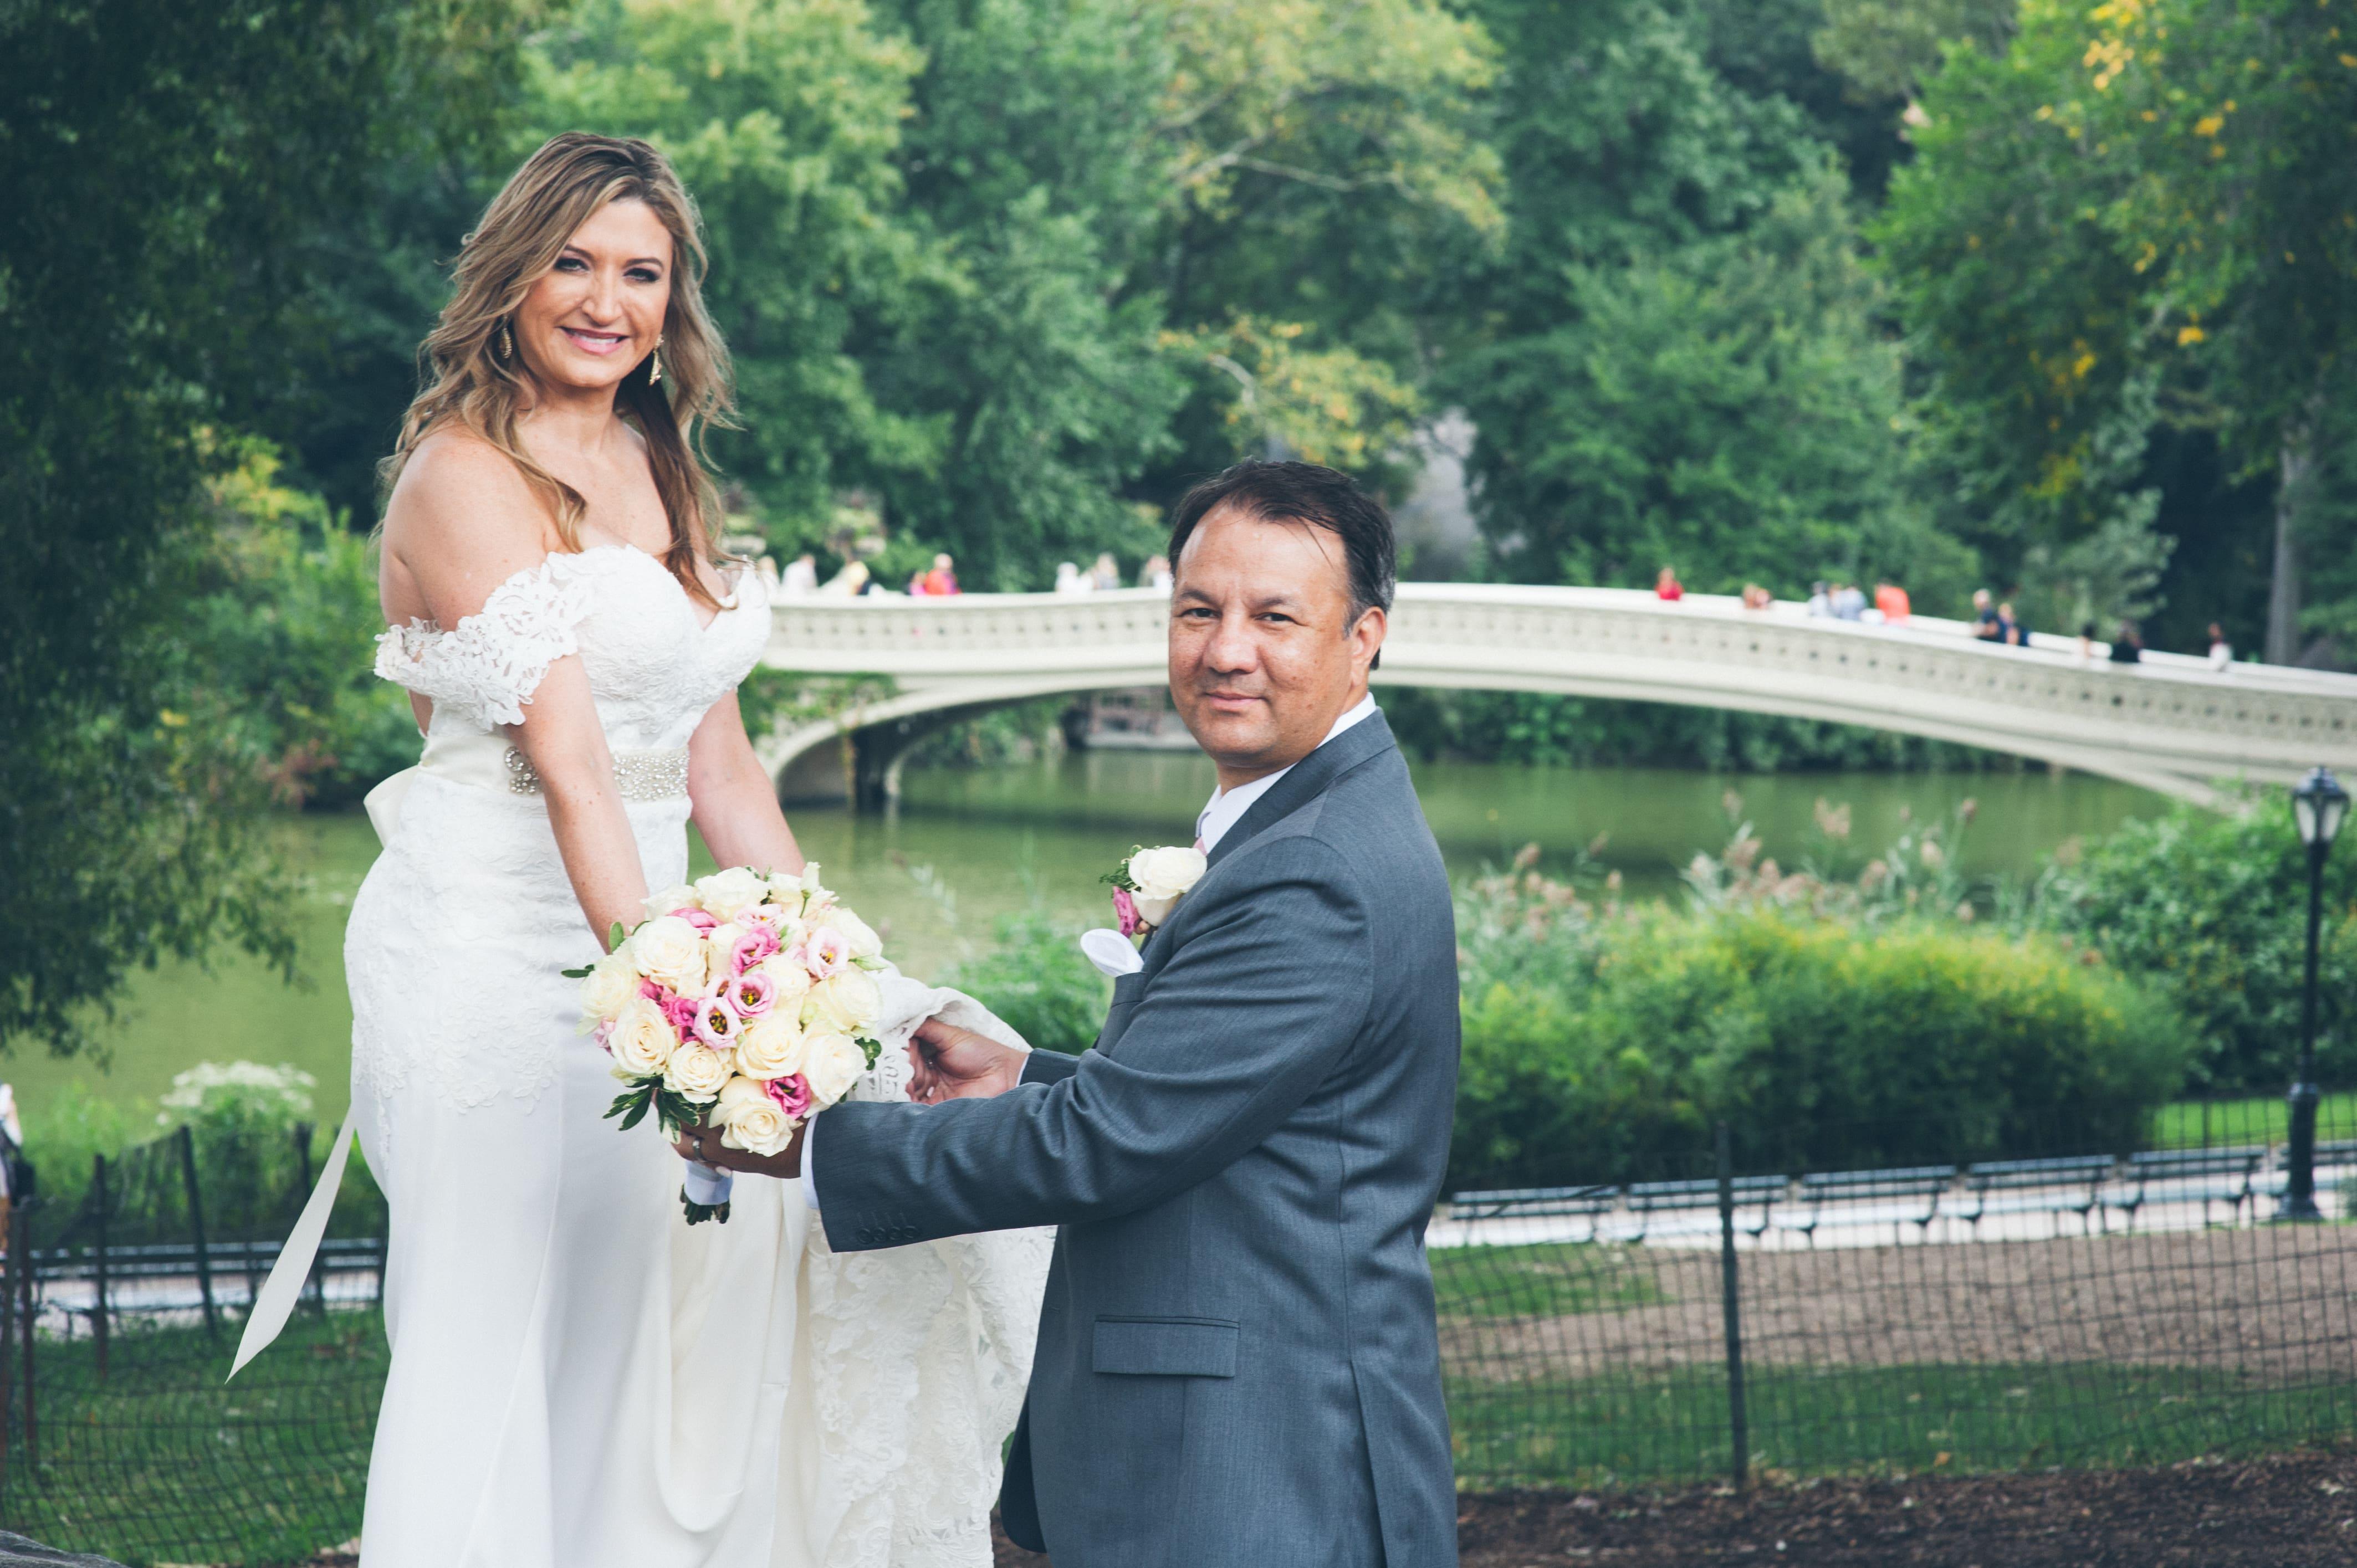 Central Park wedding locations bow bridge